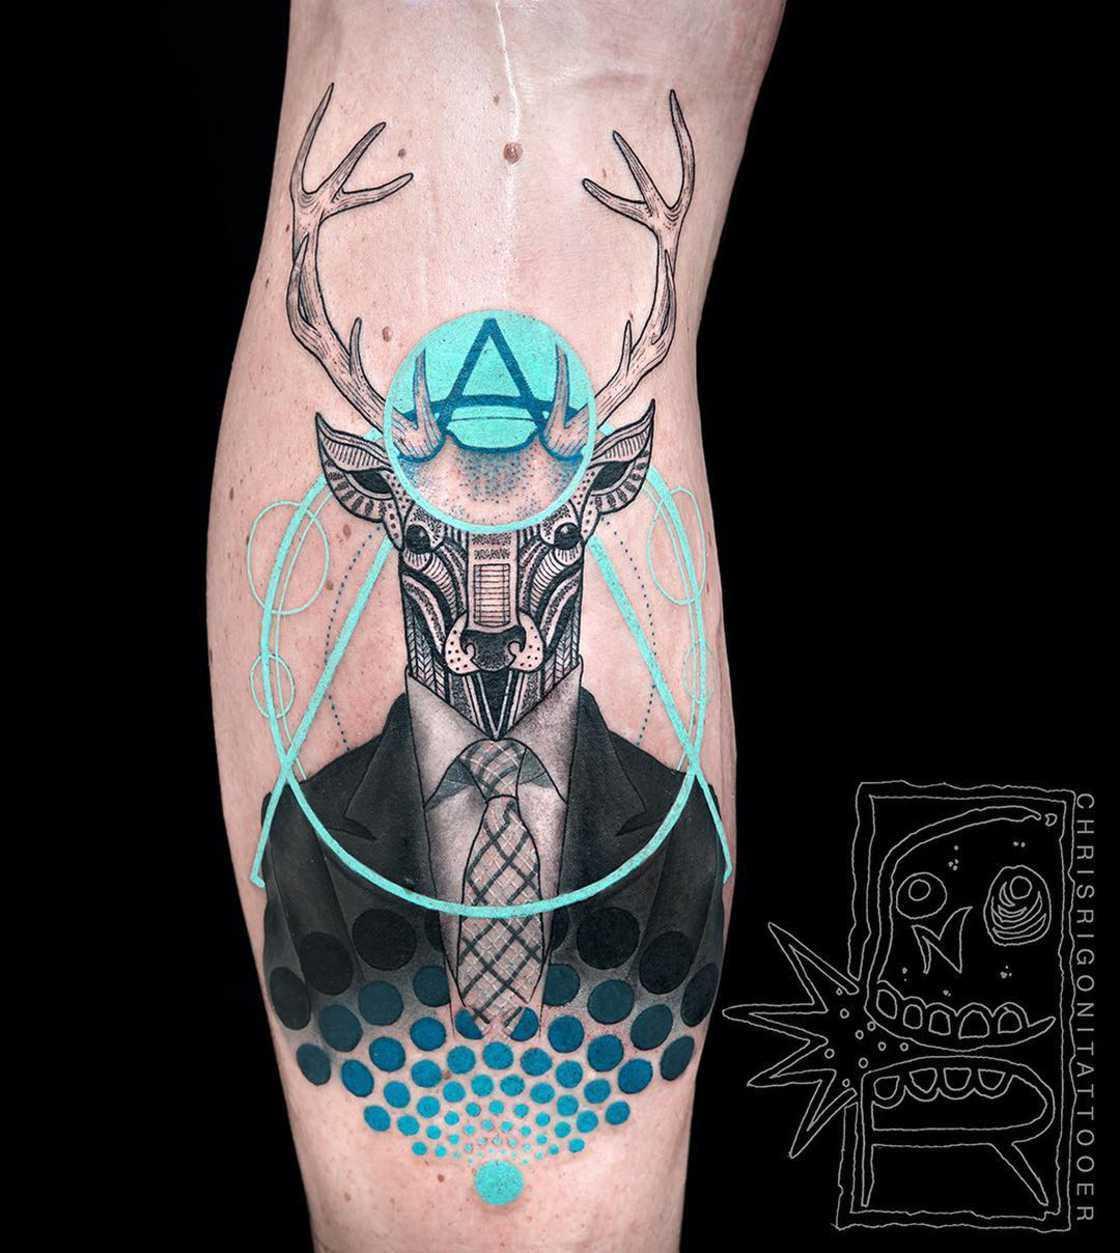 As tatuagens ultracoloridas de Chris Rigoni